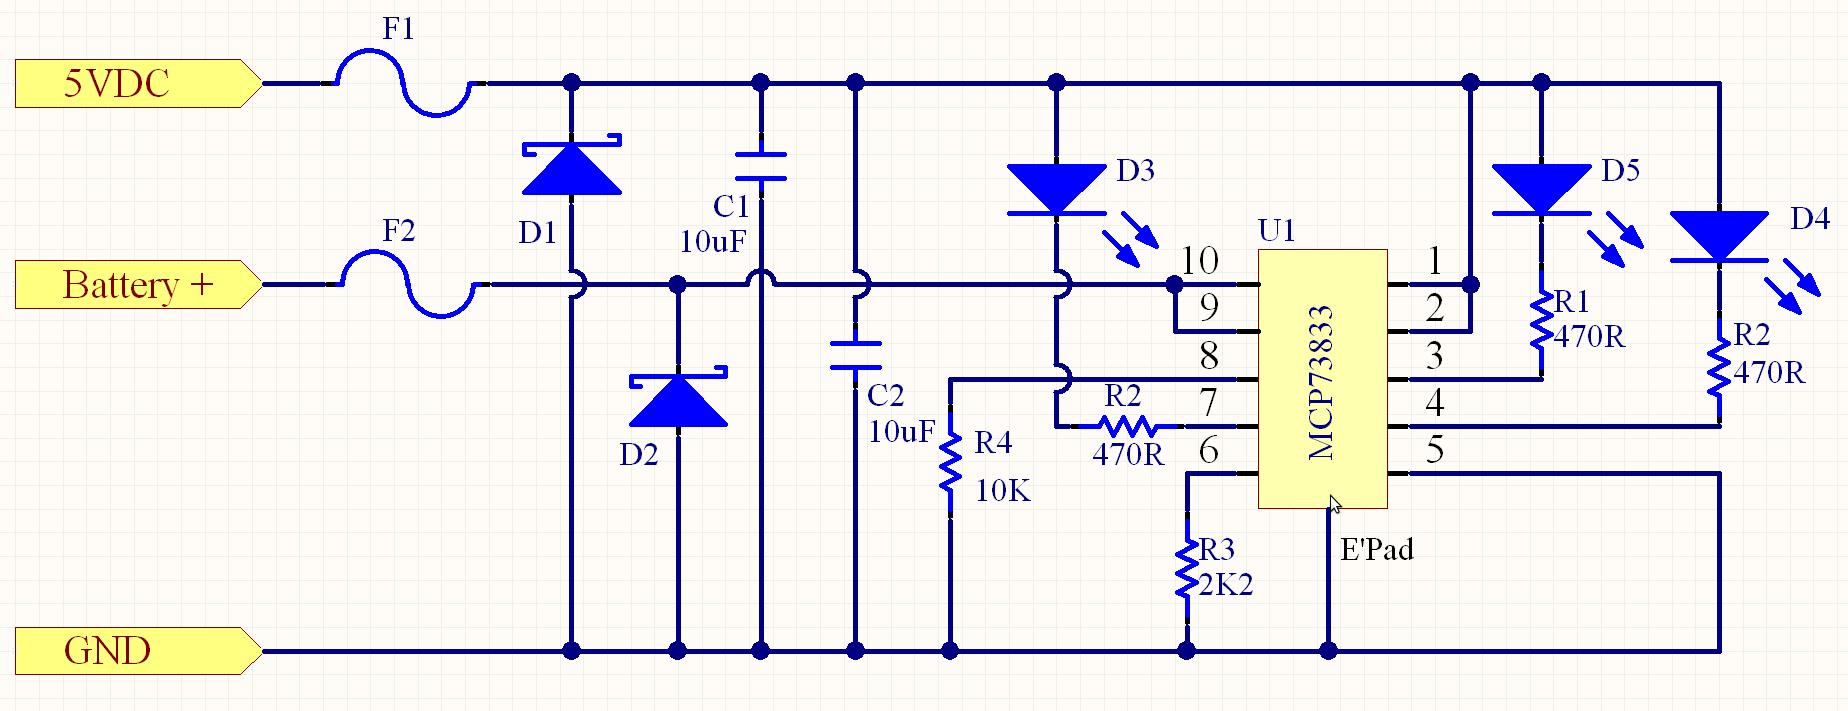 Camera Flash Schematic in addition Alarms And Security Related Schematics likewise High Voltage Stun Gun as well Flashlight Taser Wiring Diagram likewise Schematic Hex Pcb. on taser schematics free wiring diagram schematic